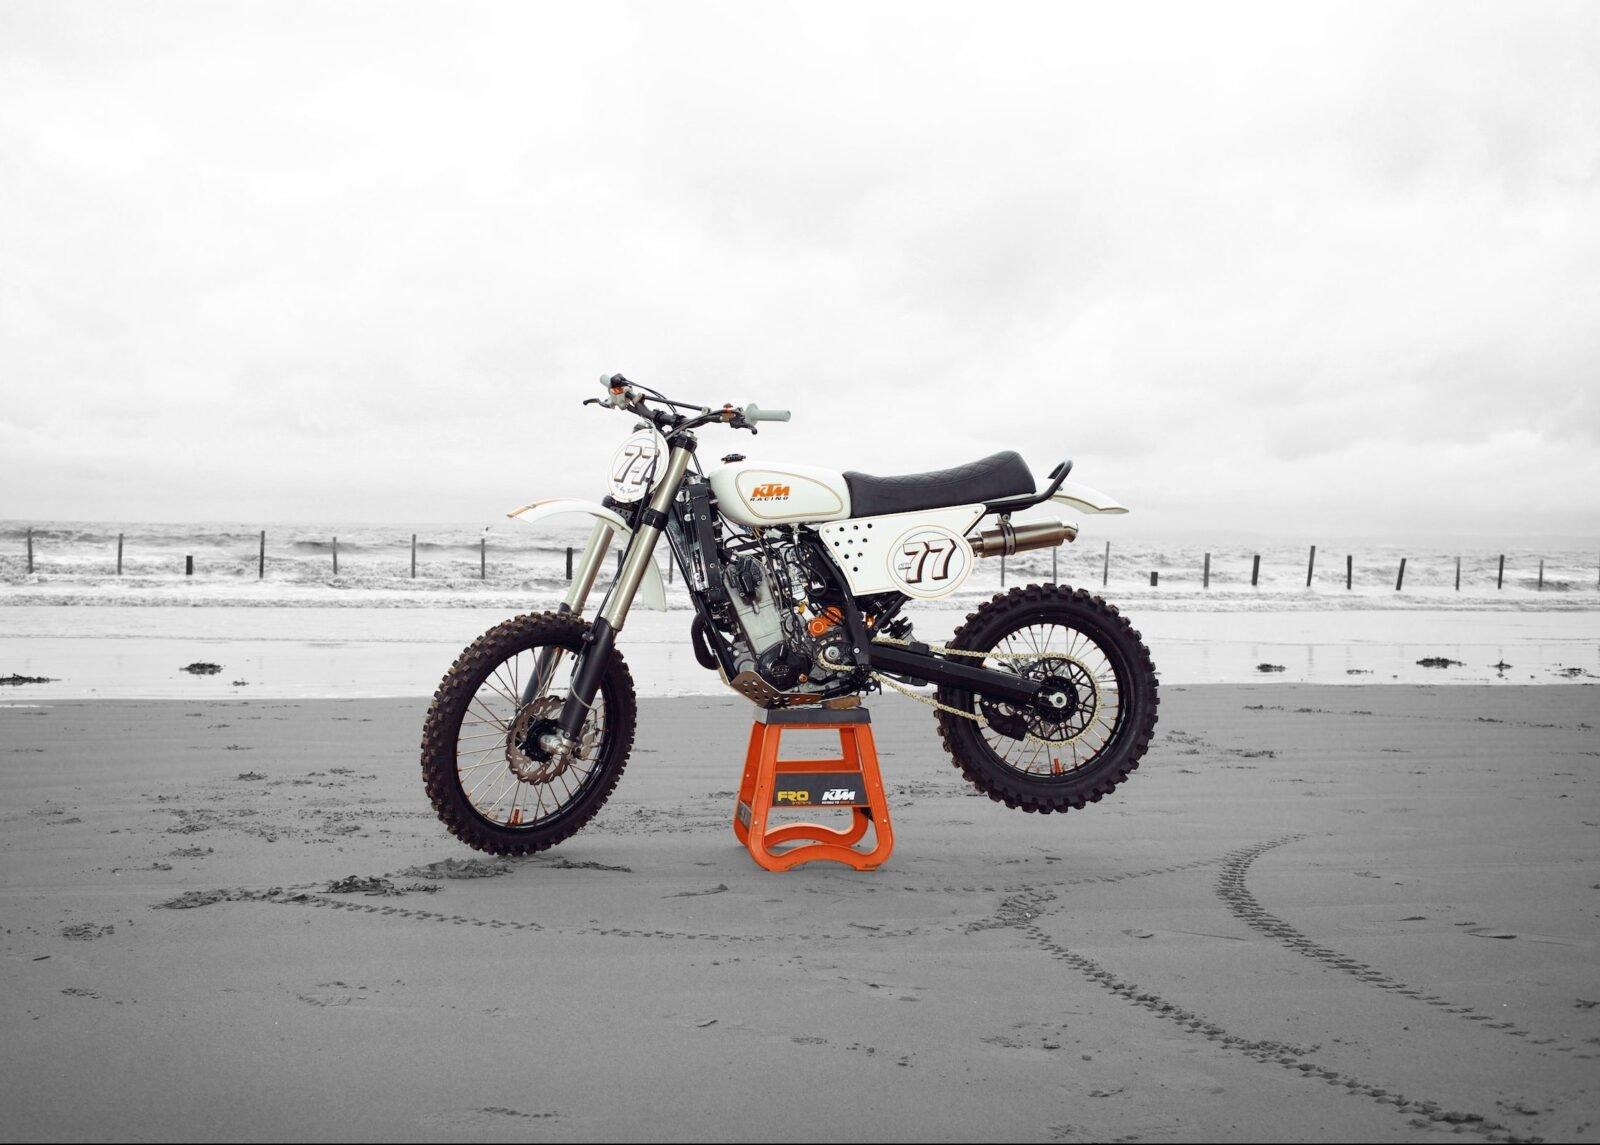 KTM Custom Motorcycle Retro e1507792366159 1600x1145 - Retro Racer: KTM 400 EXC-R